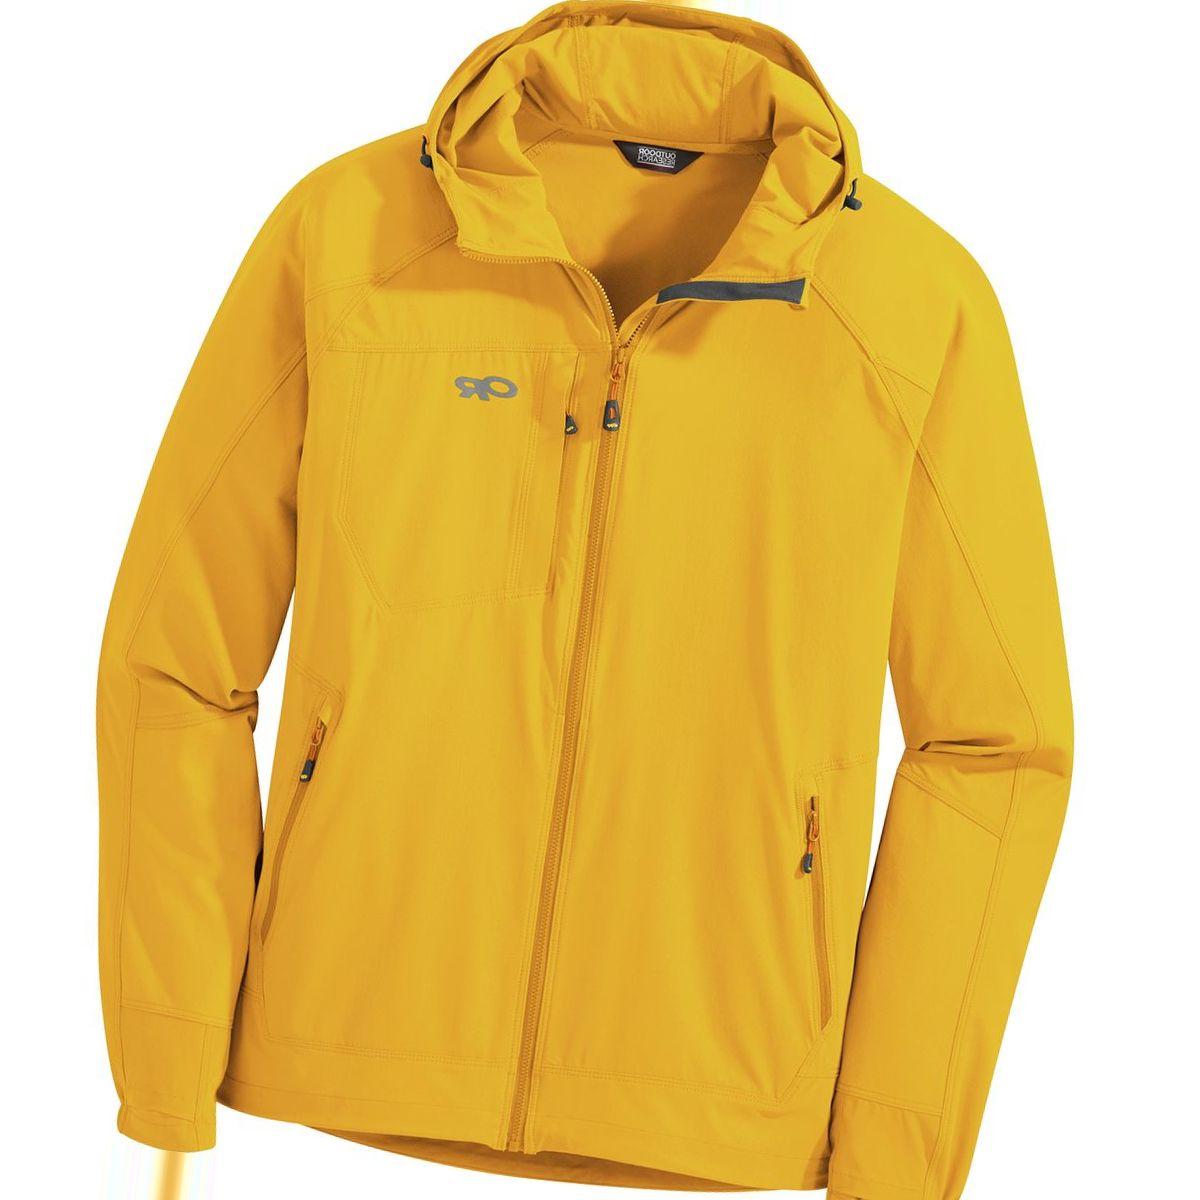 Outdoor Research Ferrosi Hooded Jacket - Men's